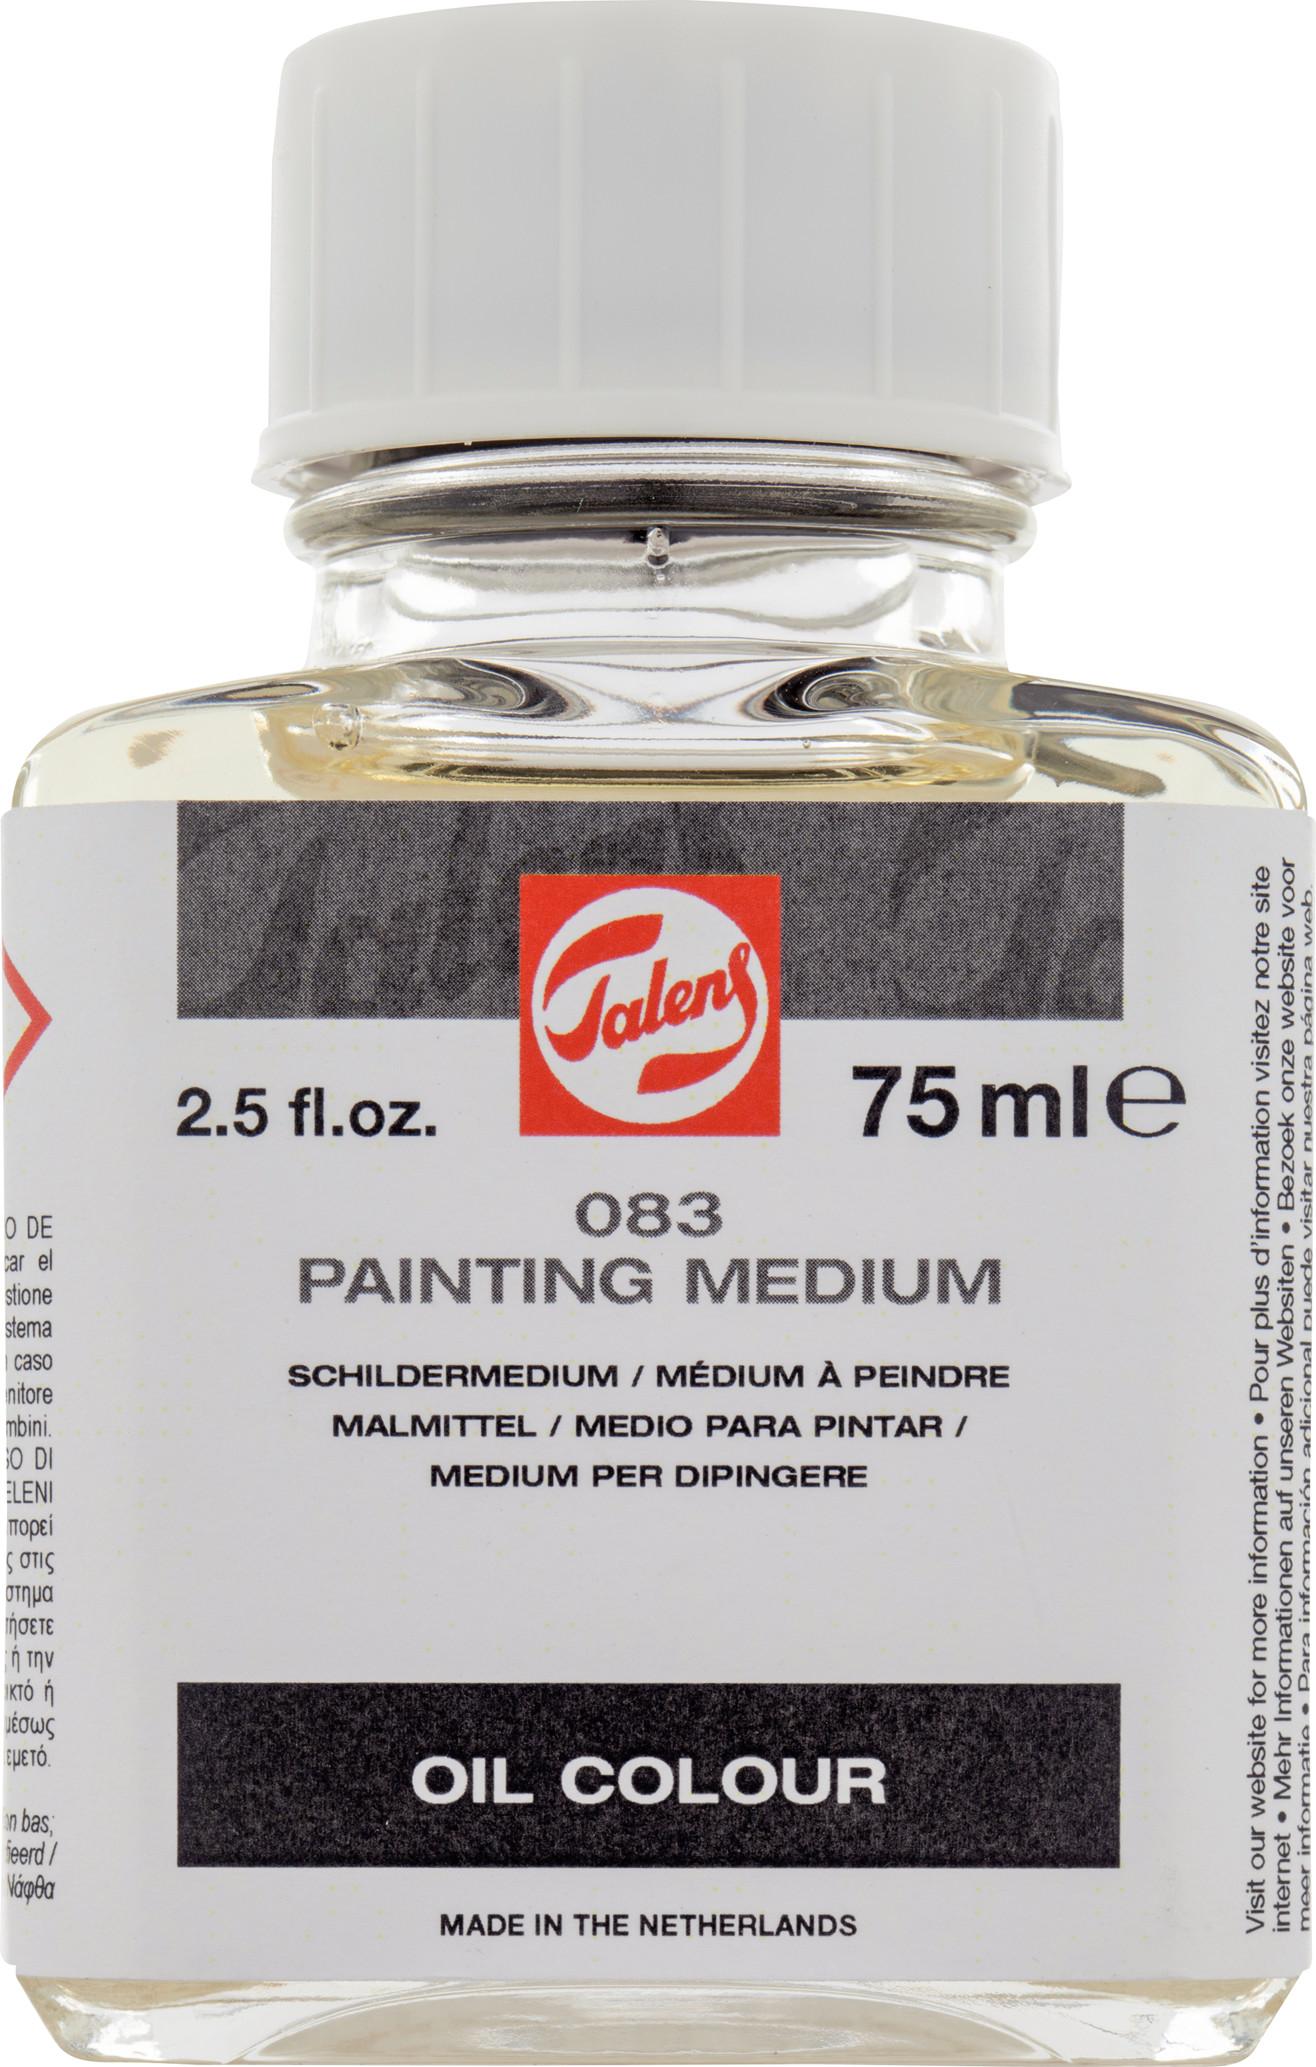 Painting Medium Normal Jar 75 ml